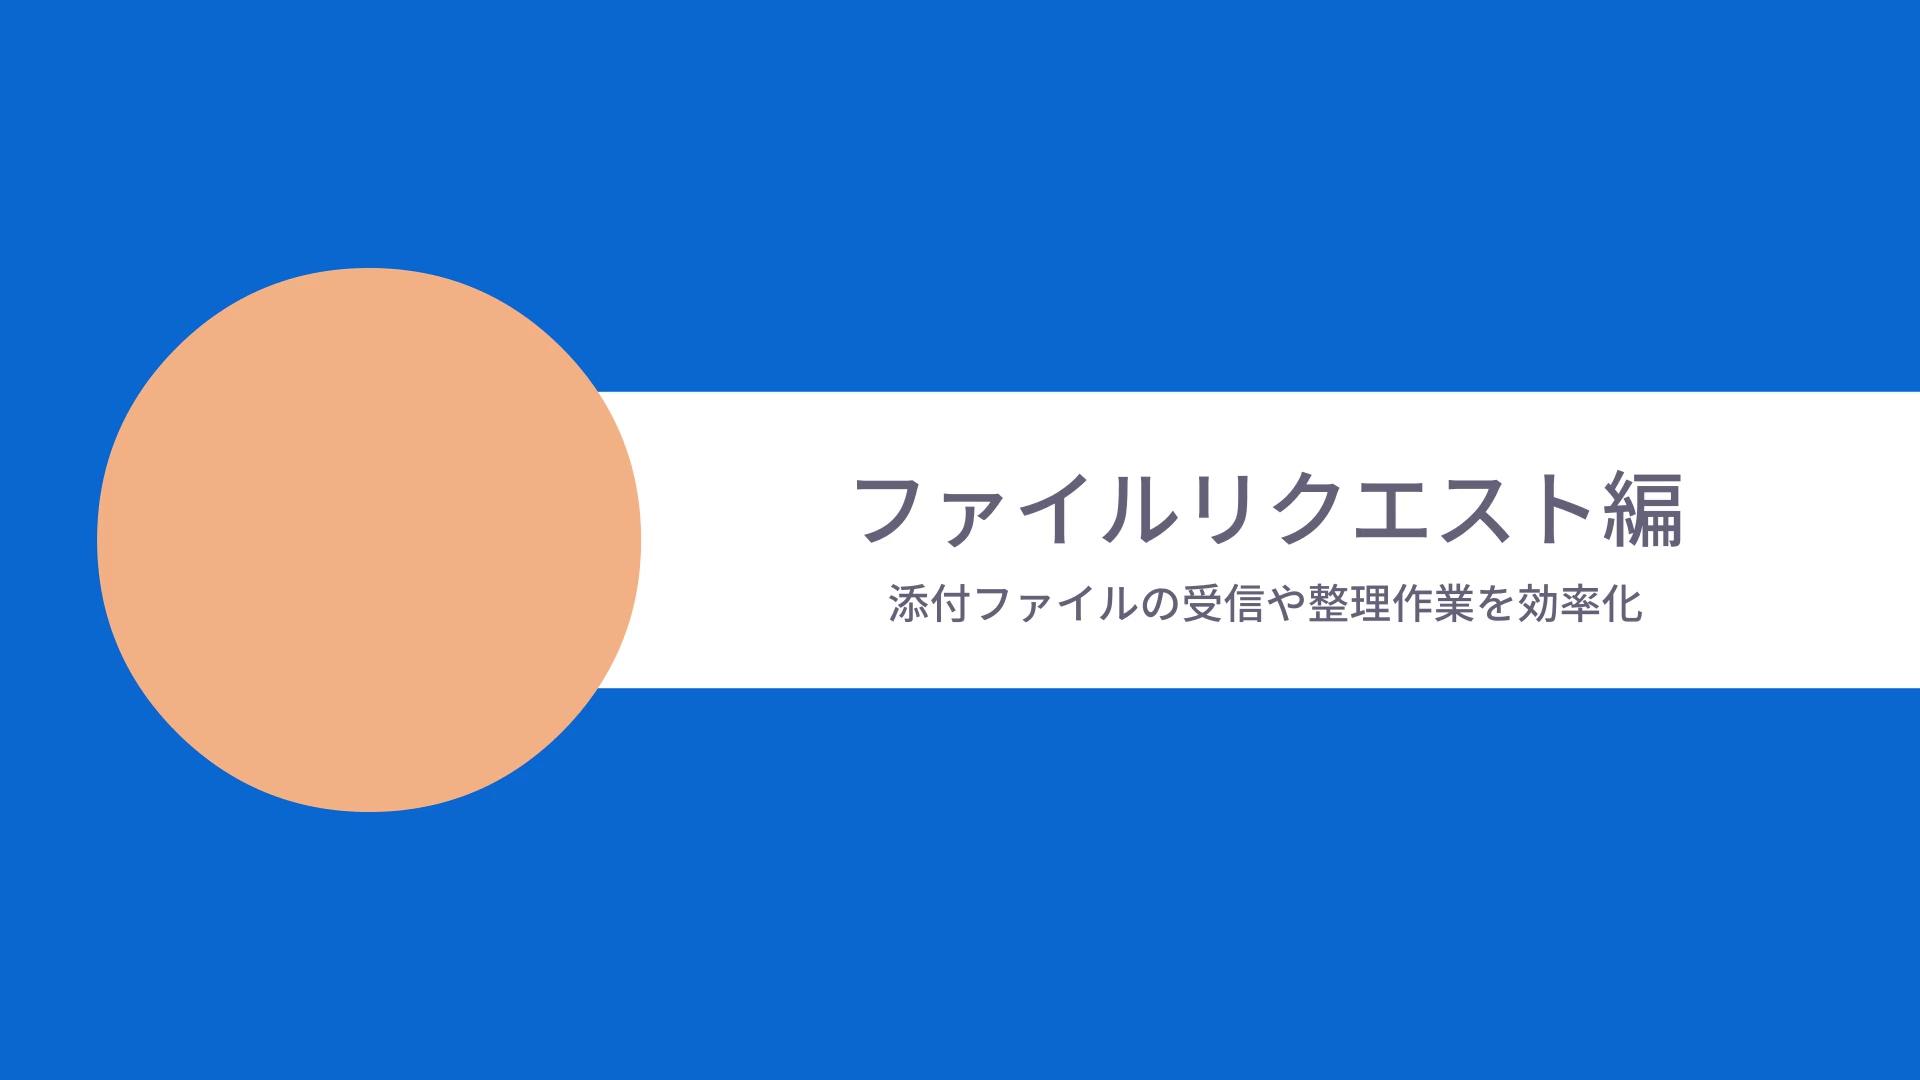 [Boxユースケースムービー] ファイルリクエスト編